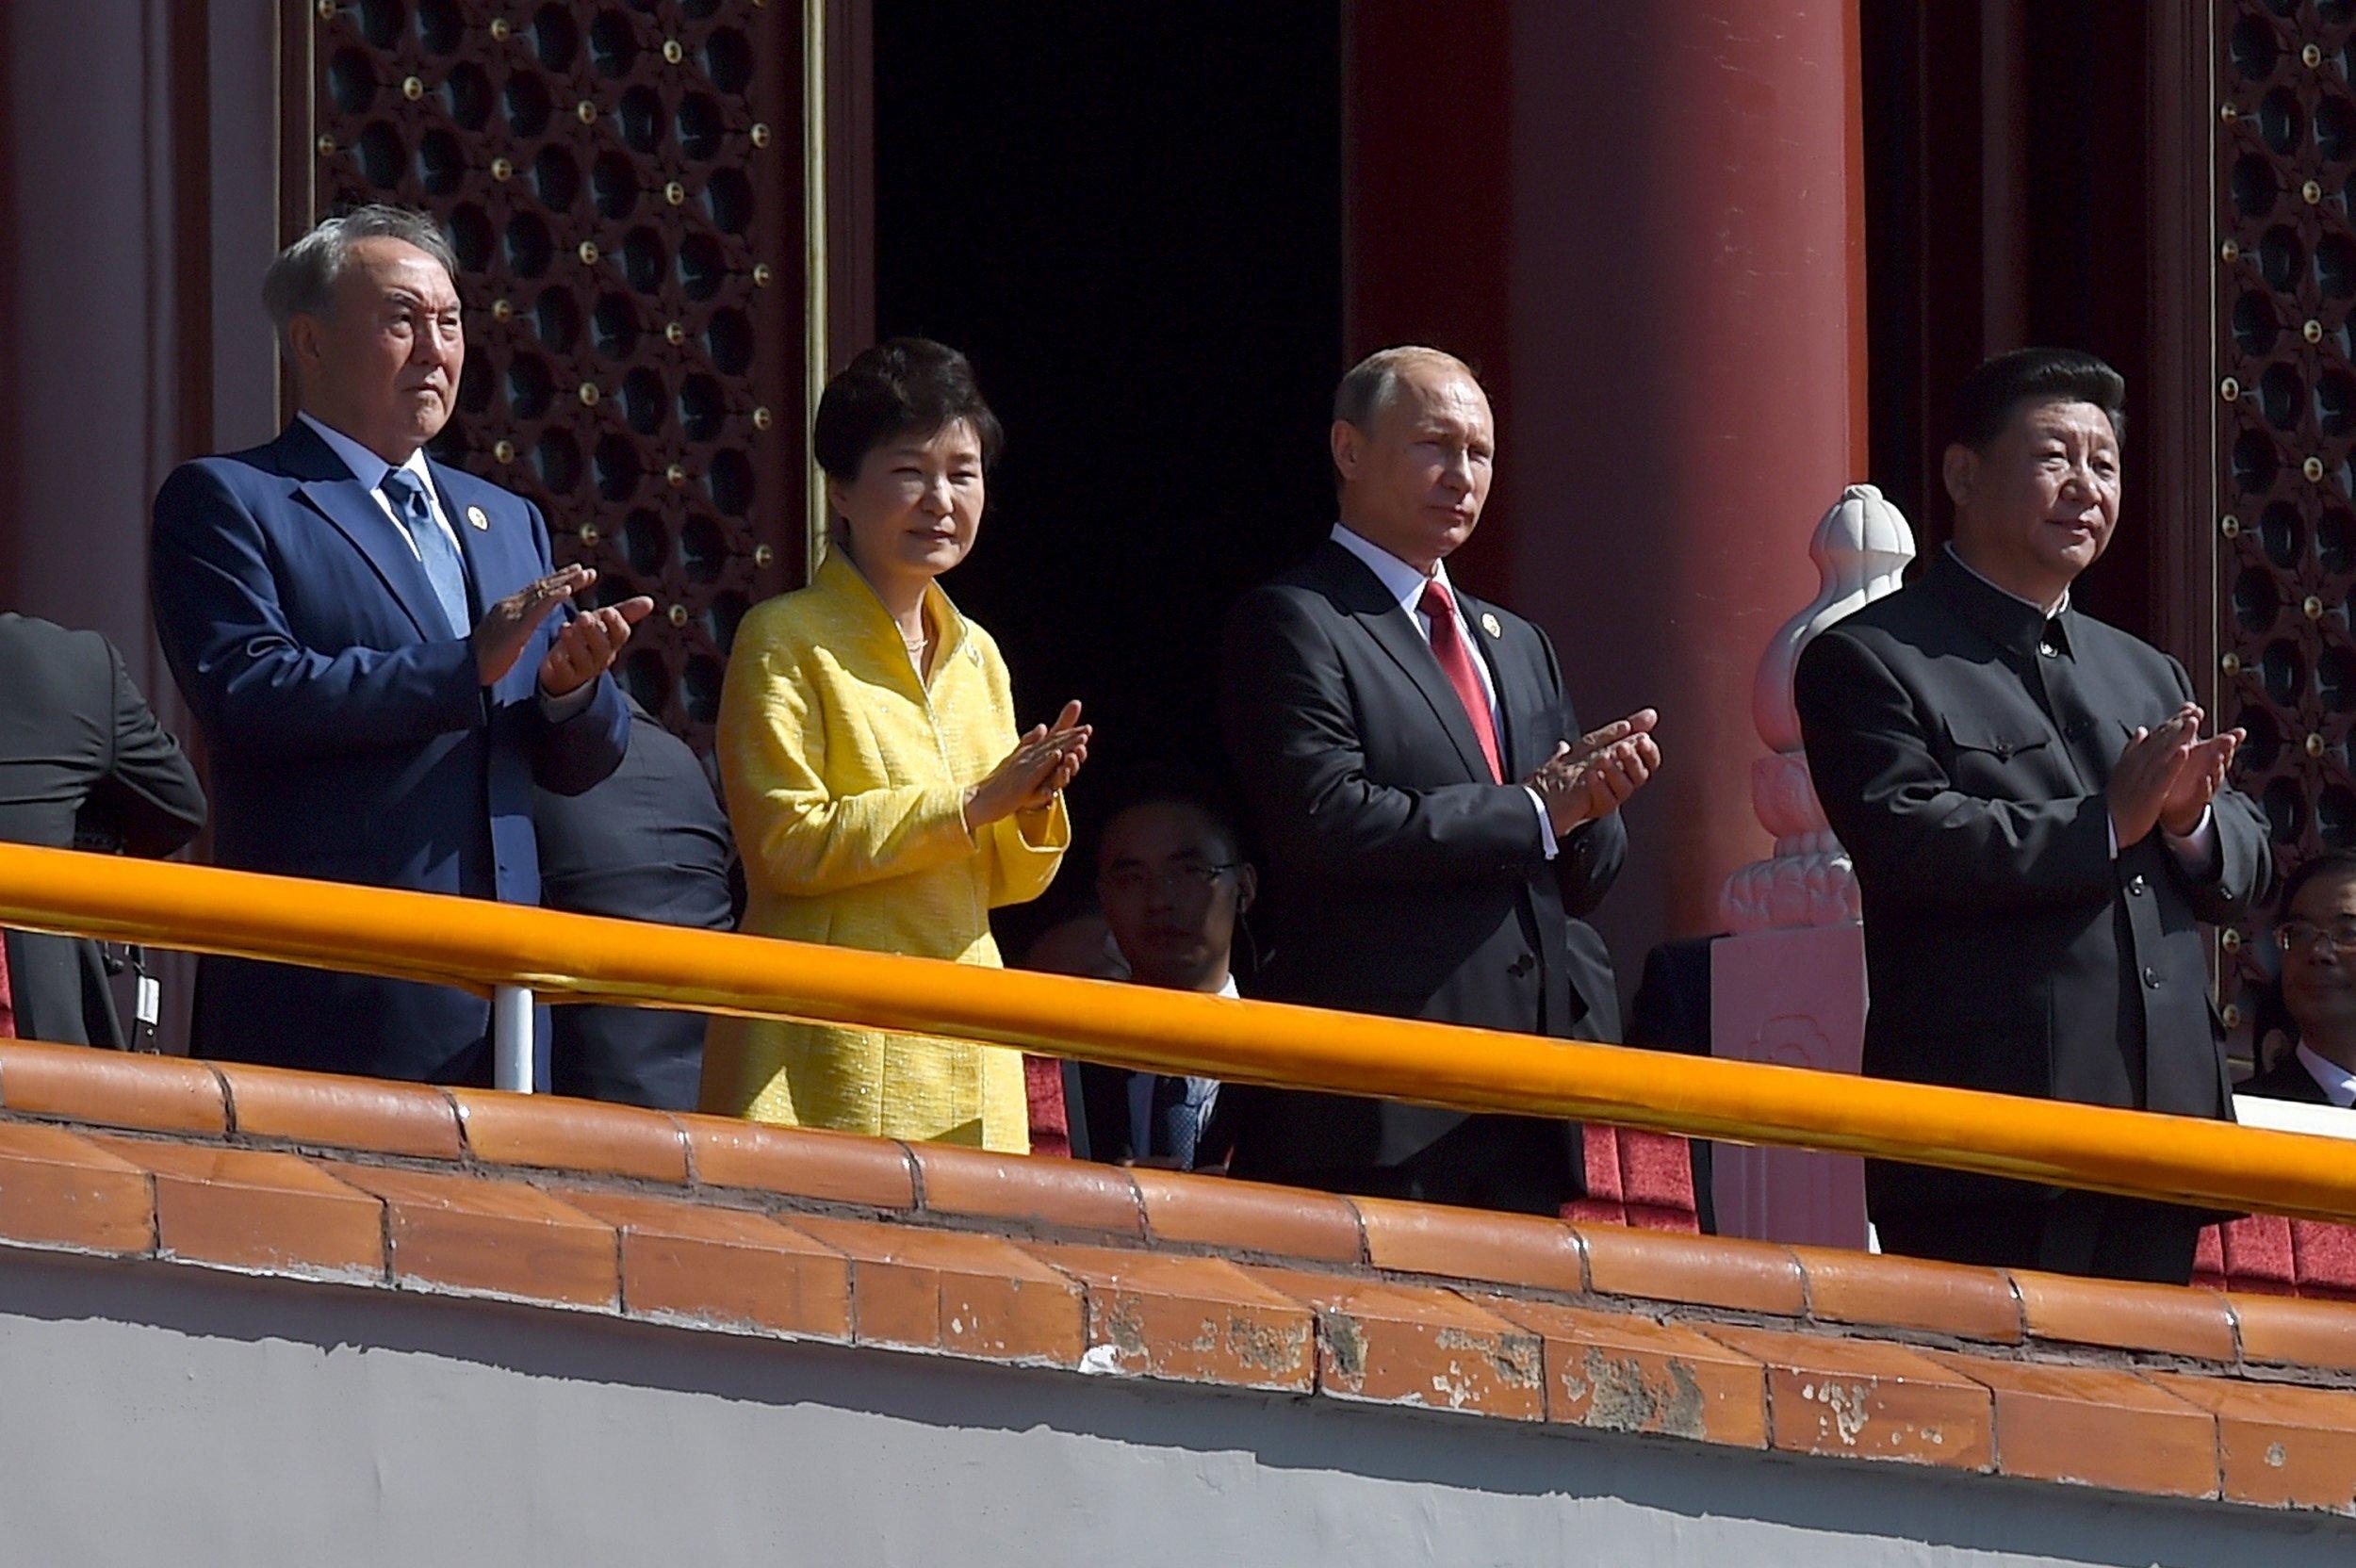 Putin and Xi in Beijing